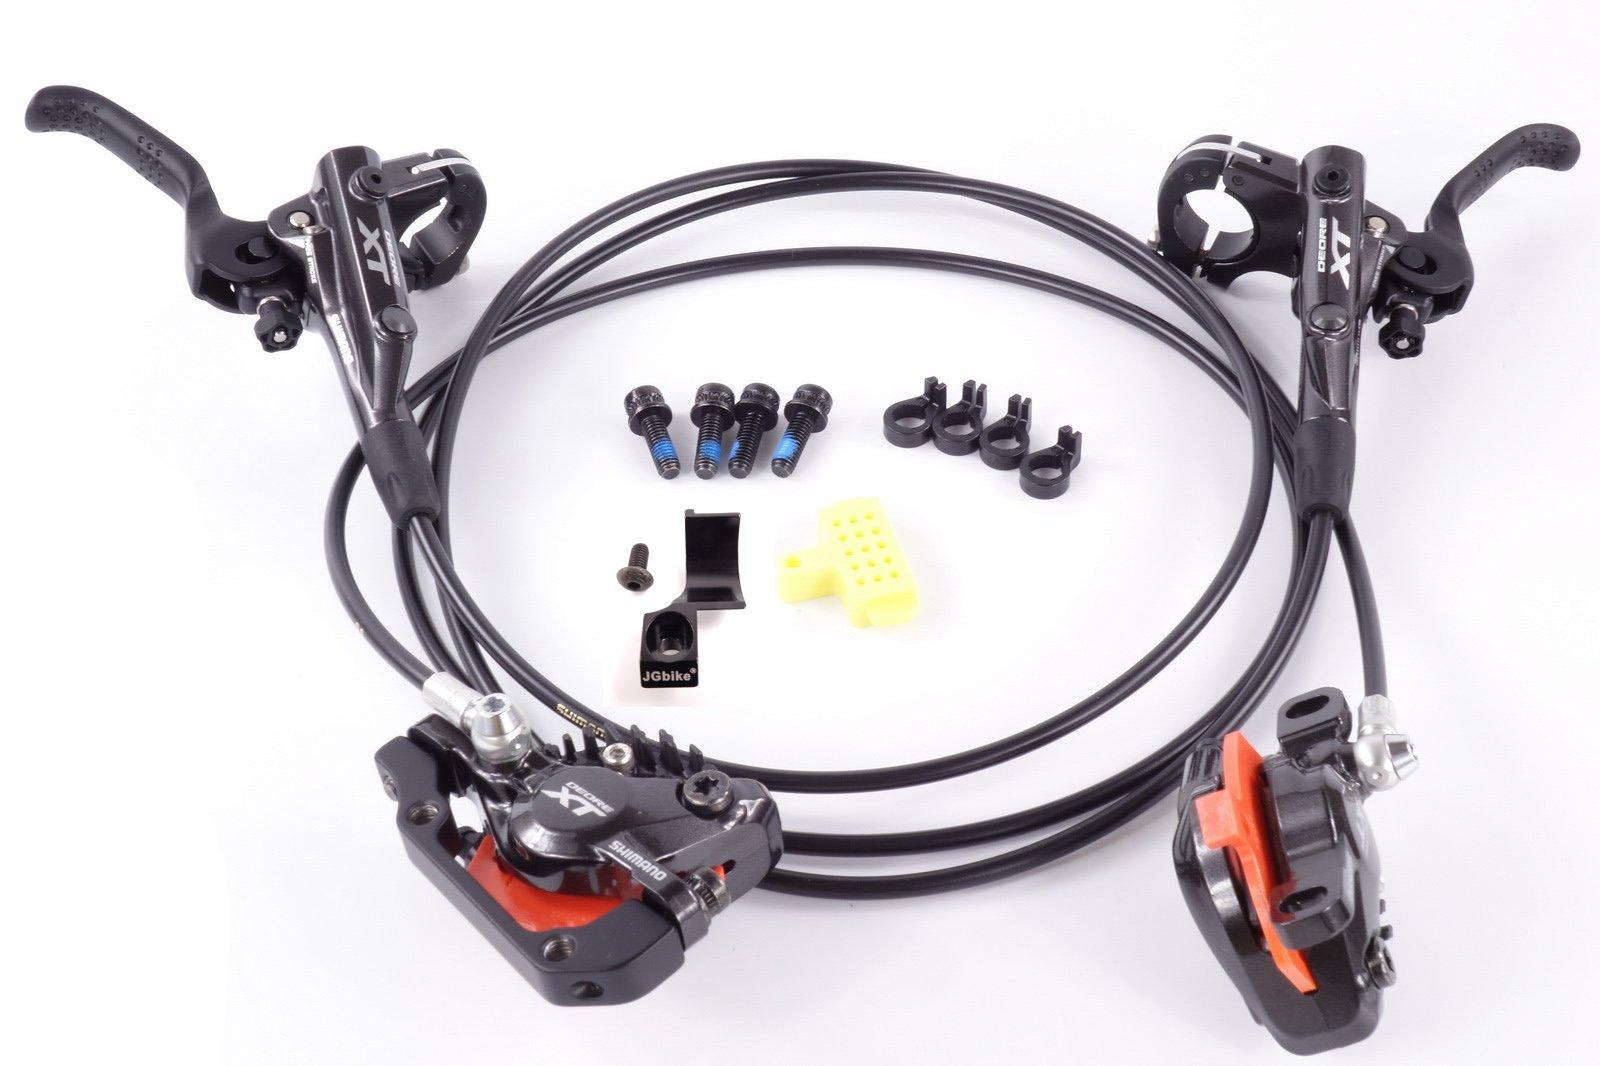 Shimano Deore XT M8000 Hydraulic Disk Brake MTB Front & Rear Set 800mm/1400mm